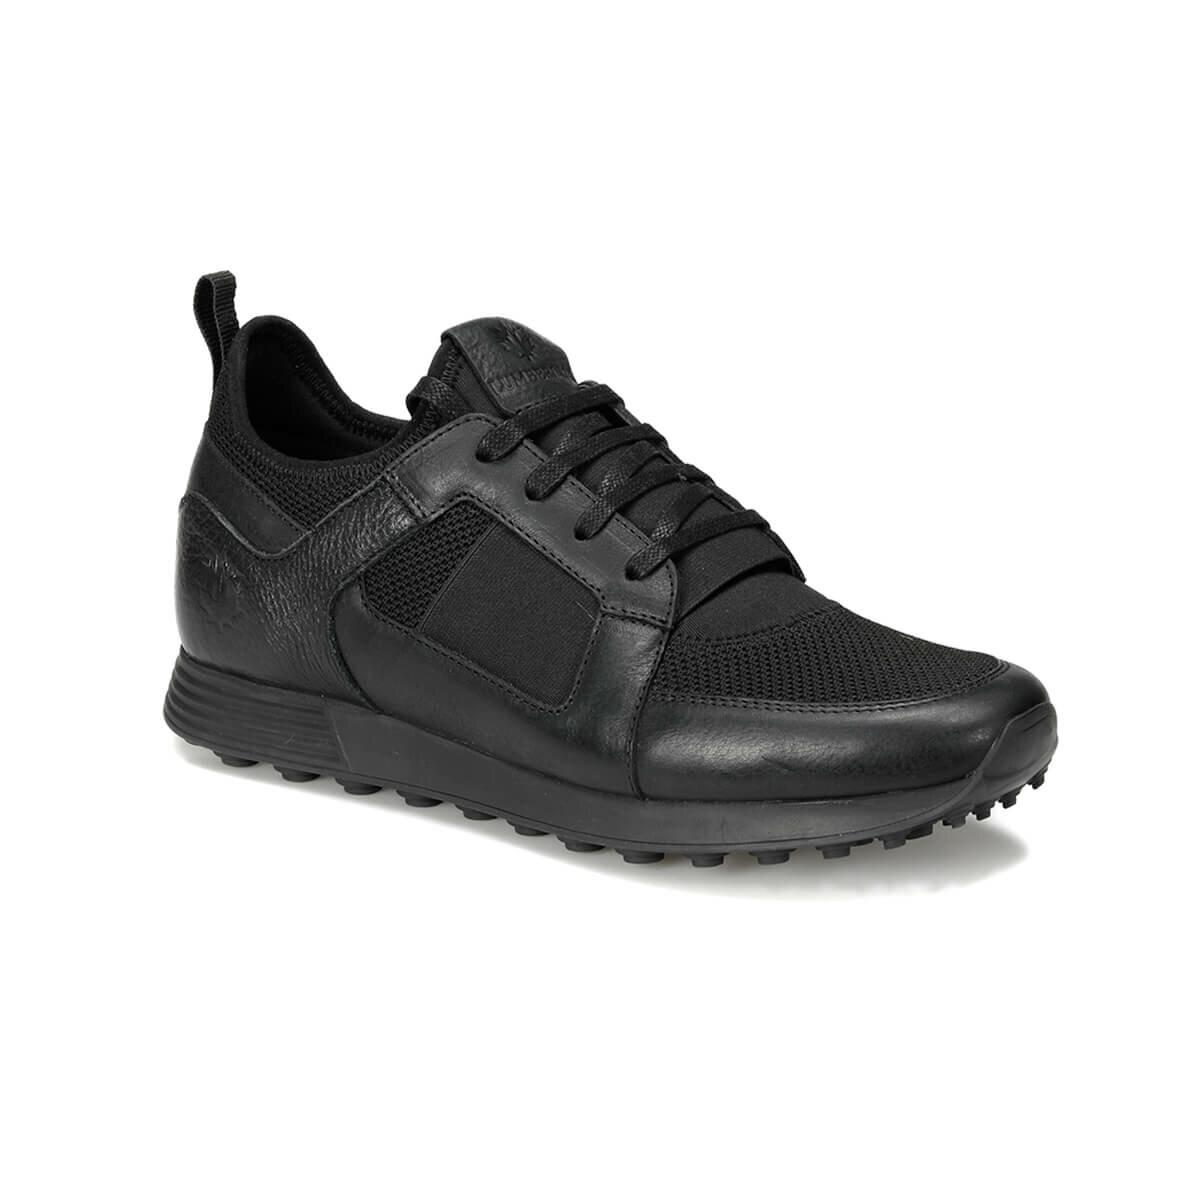 FLO HAMILTON 9PR Black Men 'S Sneaker Shoes LUMBERJACK